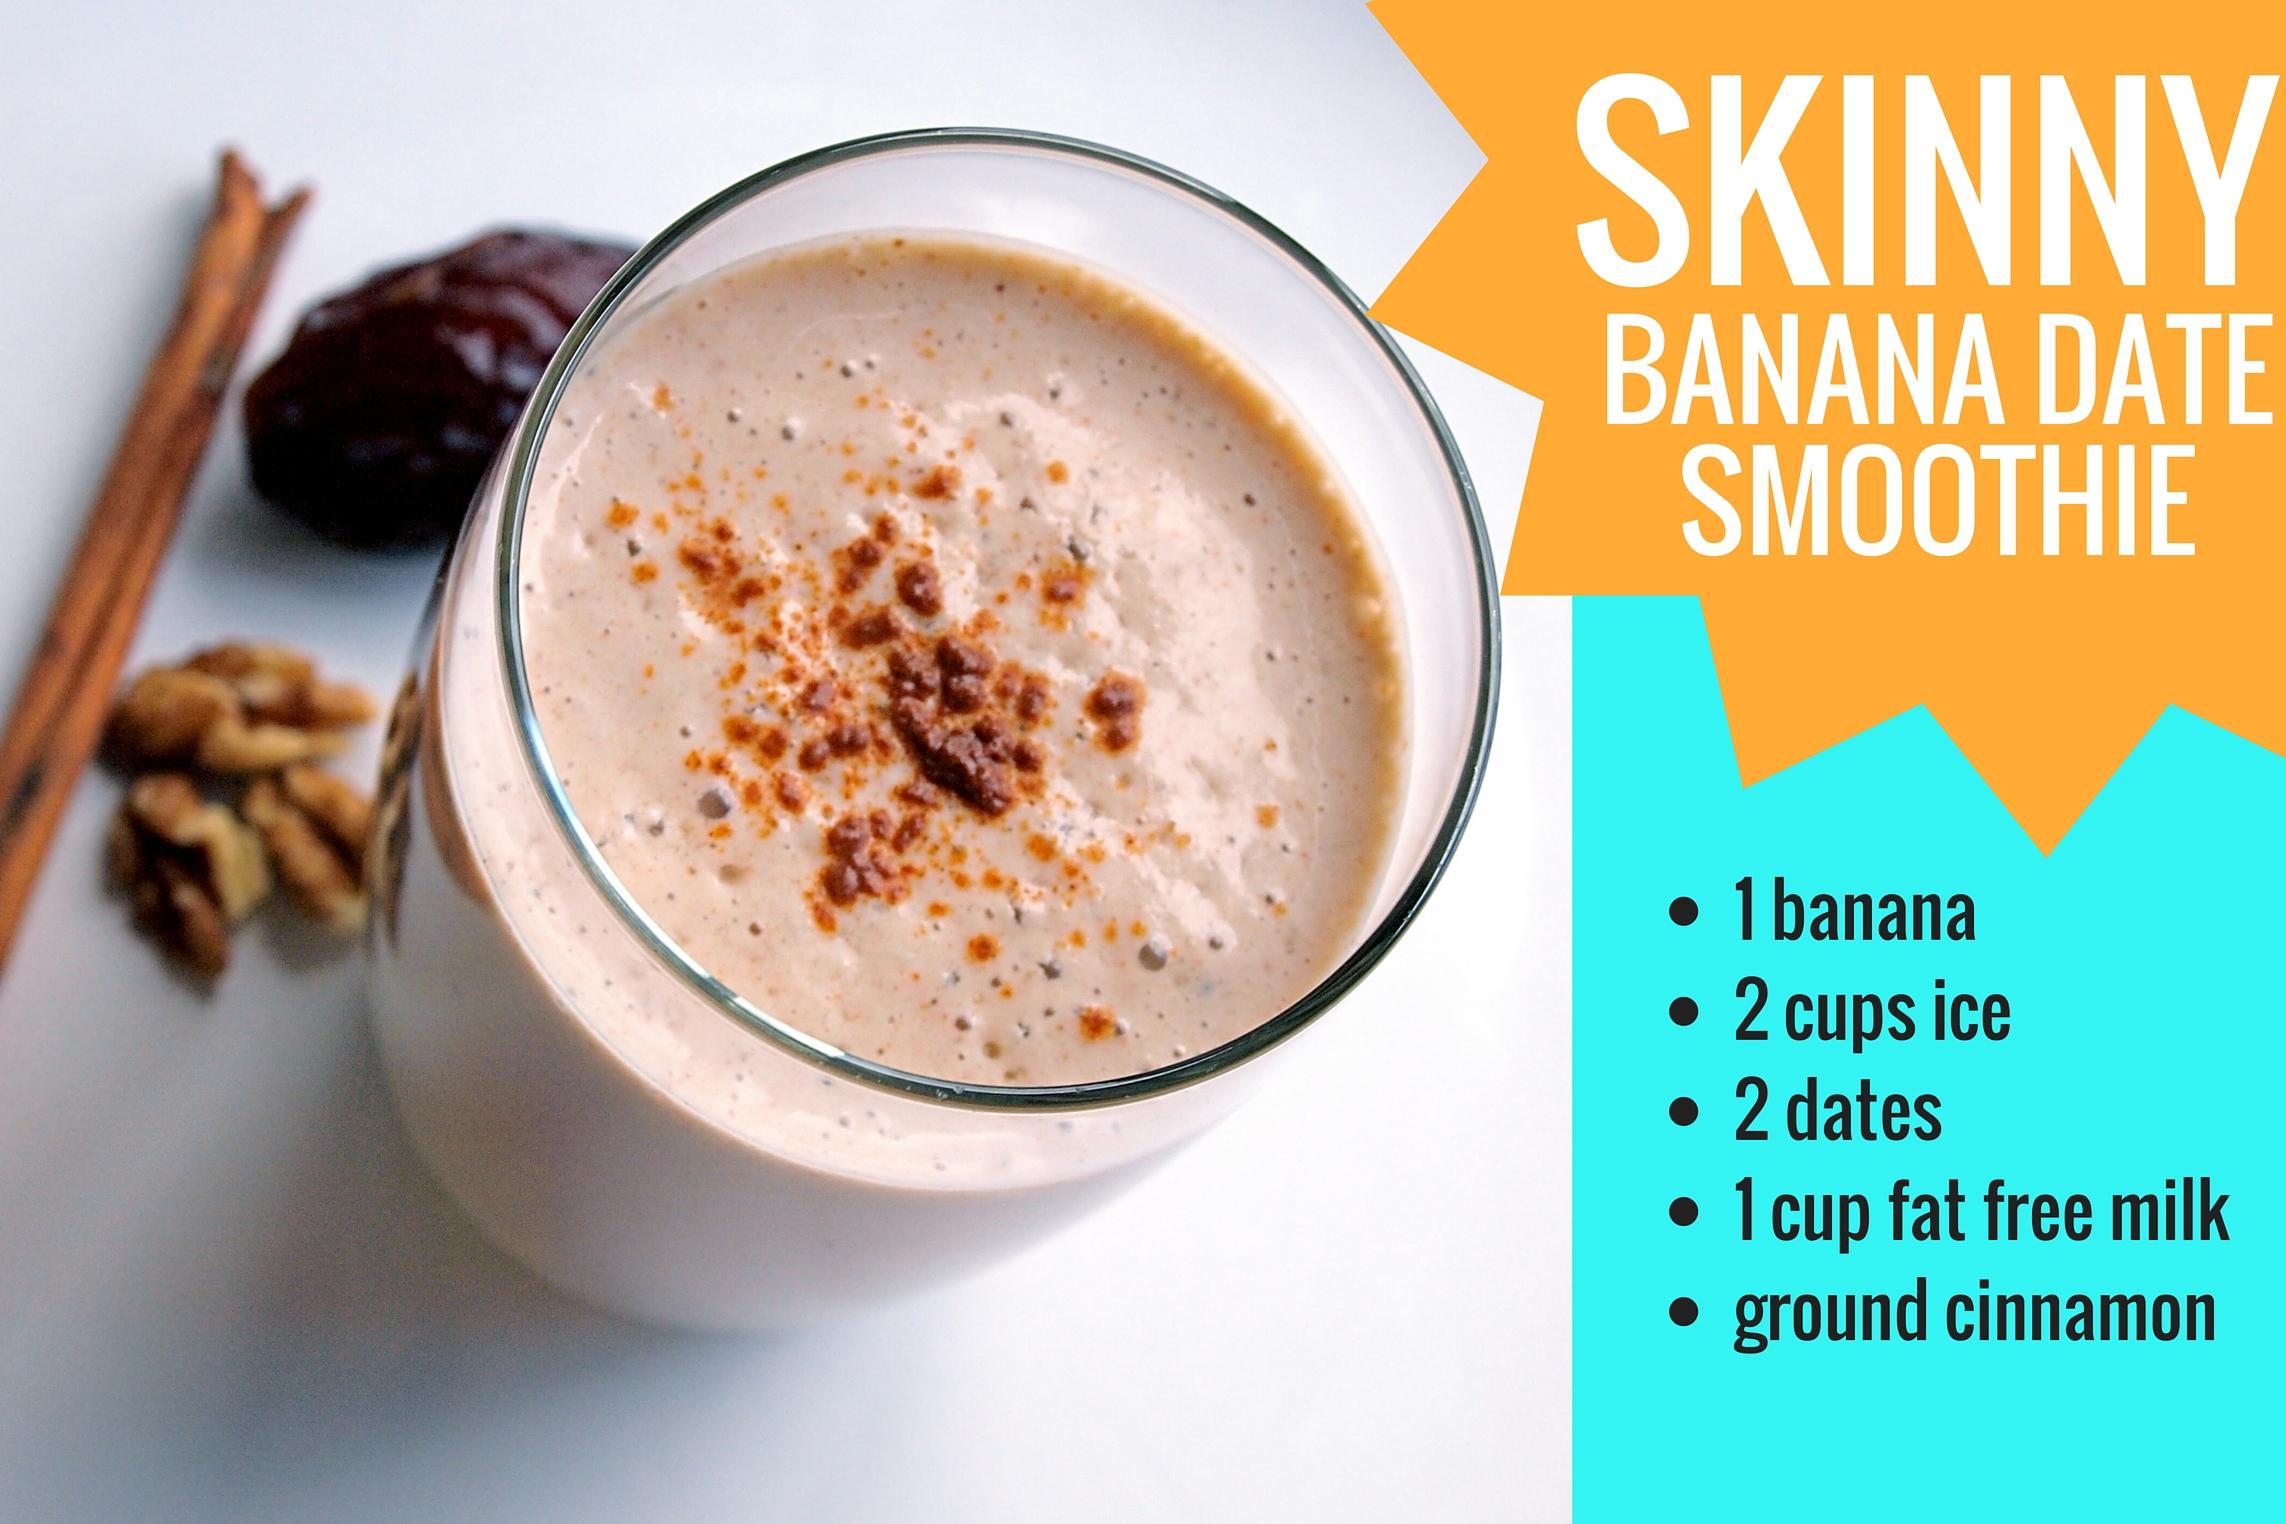 SKINNY Banana Date Smoothie